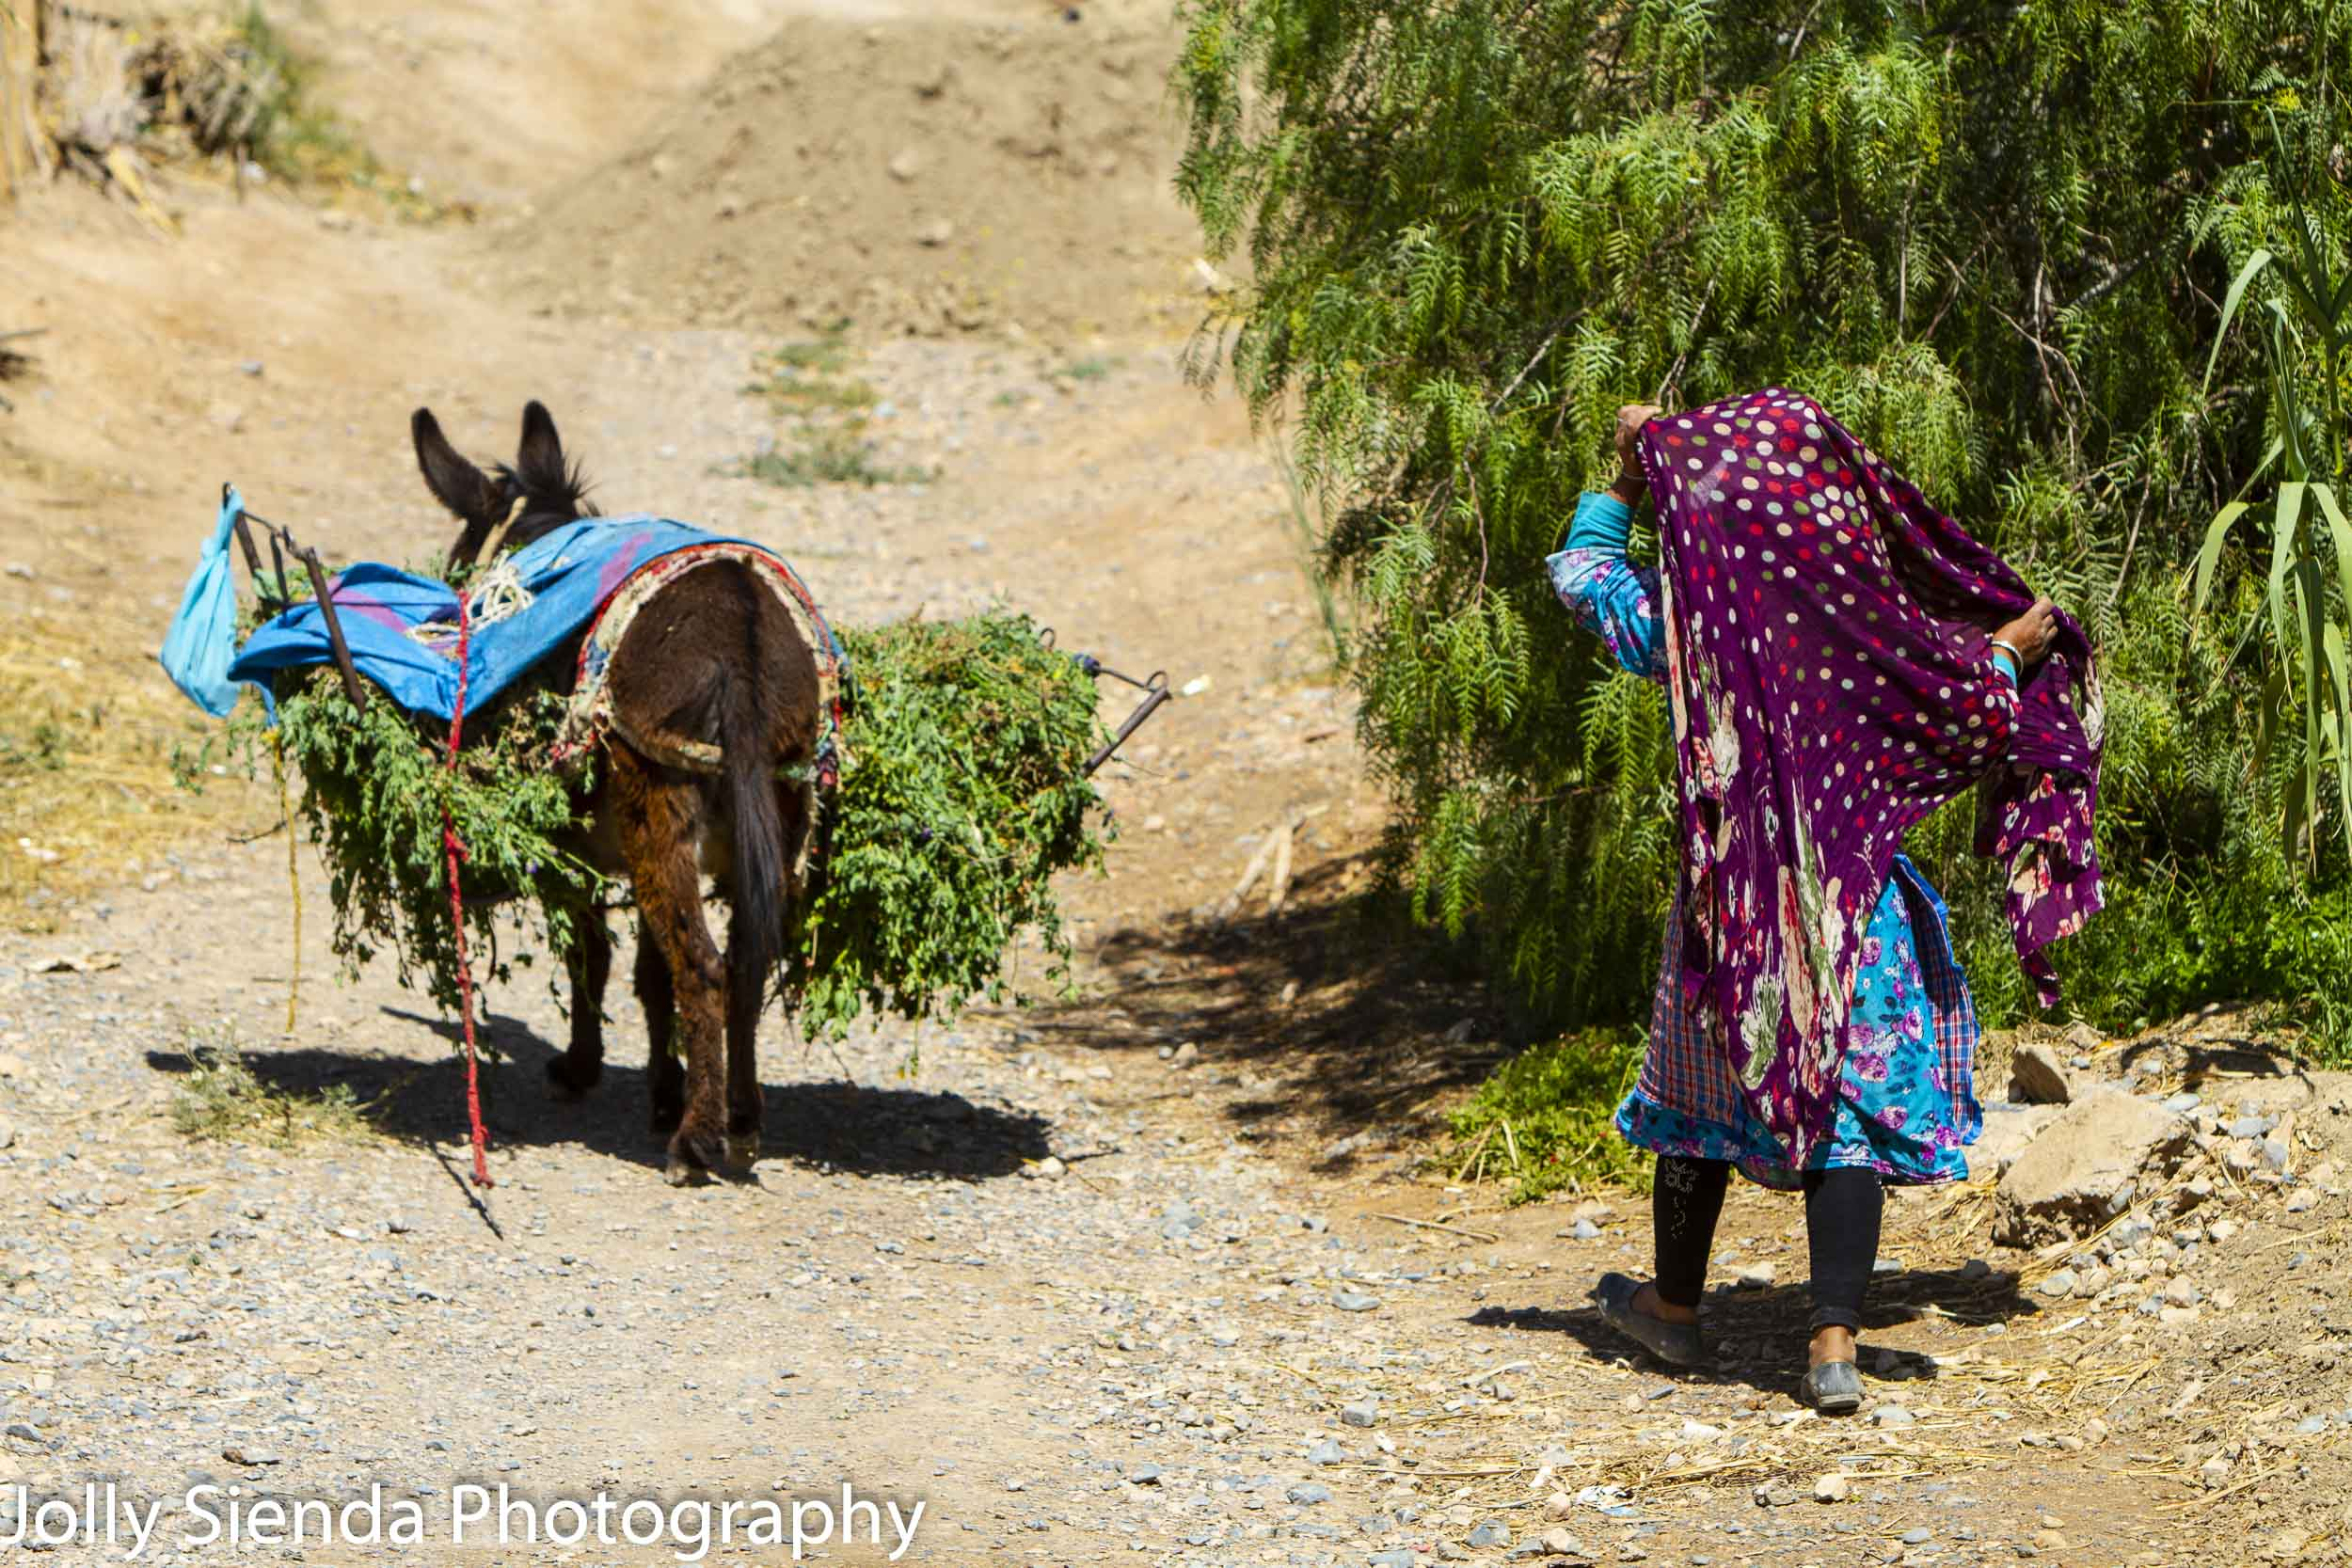 Berber girl follows the donkey